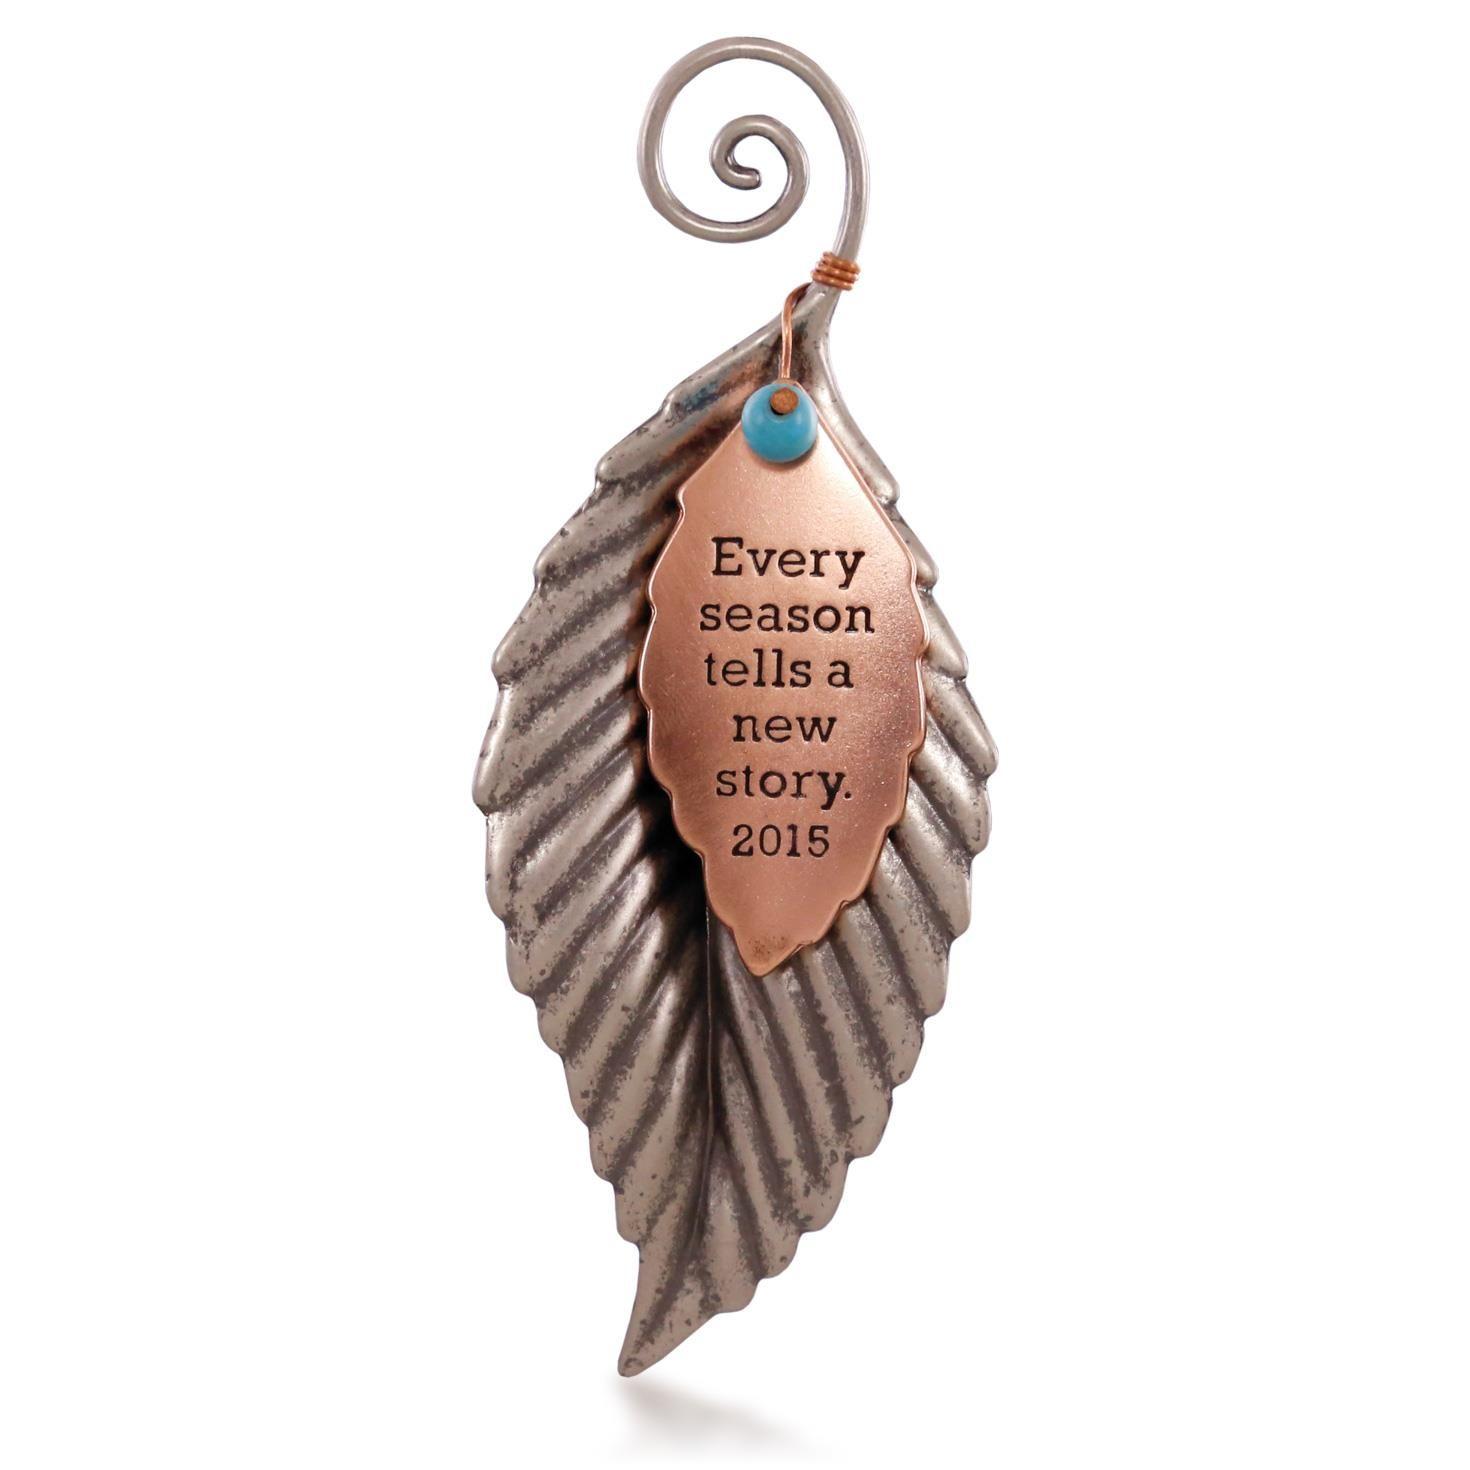 2015 A New Season  Hallmark Keepsake Celebrations At Hooked On Hallmark  Ornaments